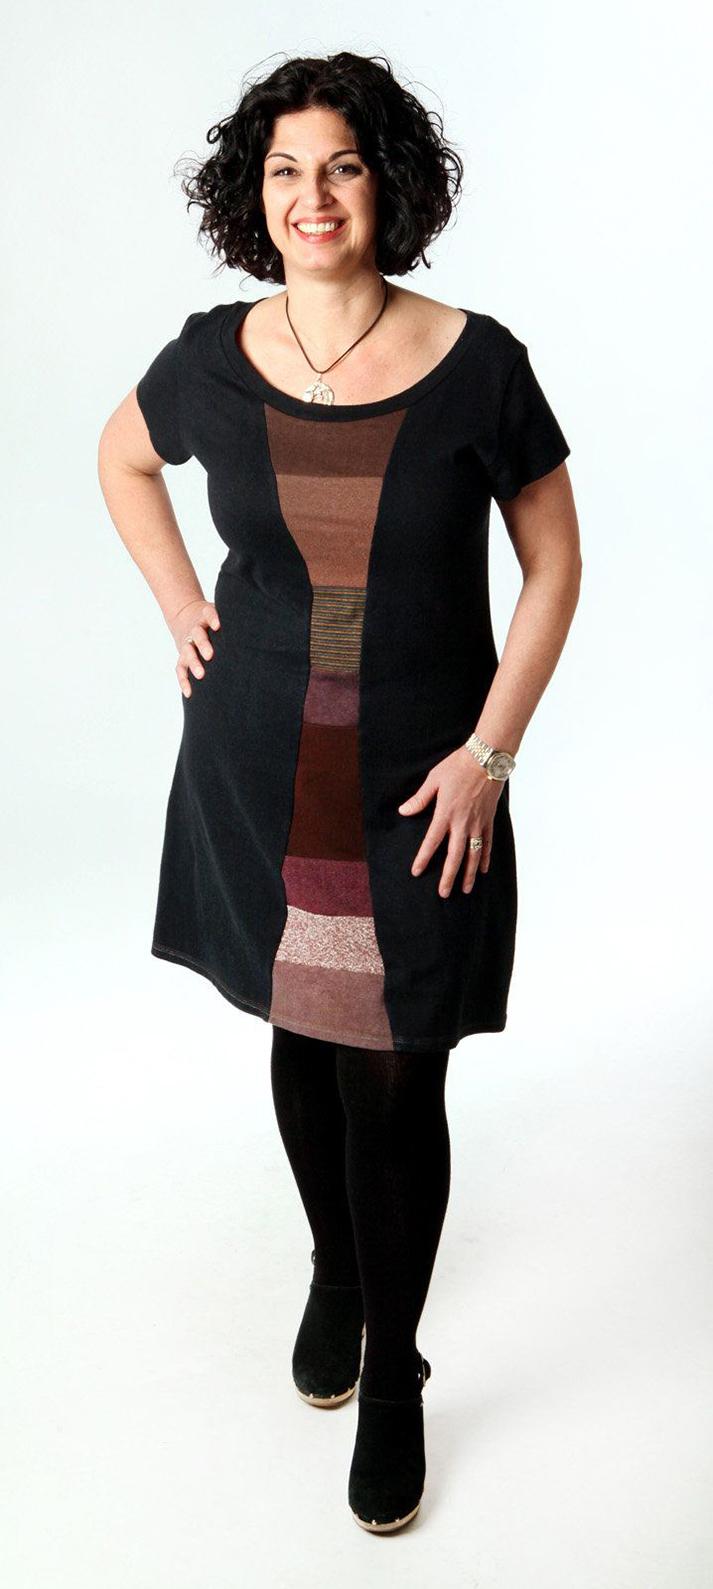 Time Travel Dress on Jennifer Marks1.jpg